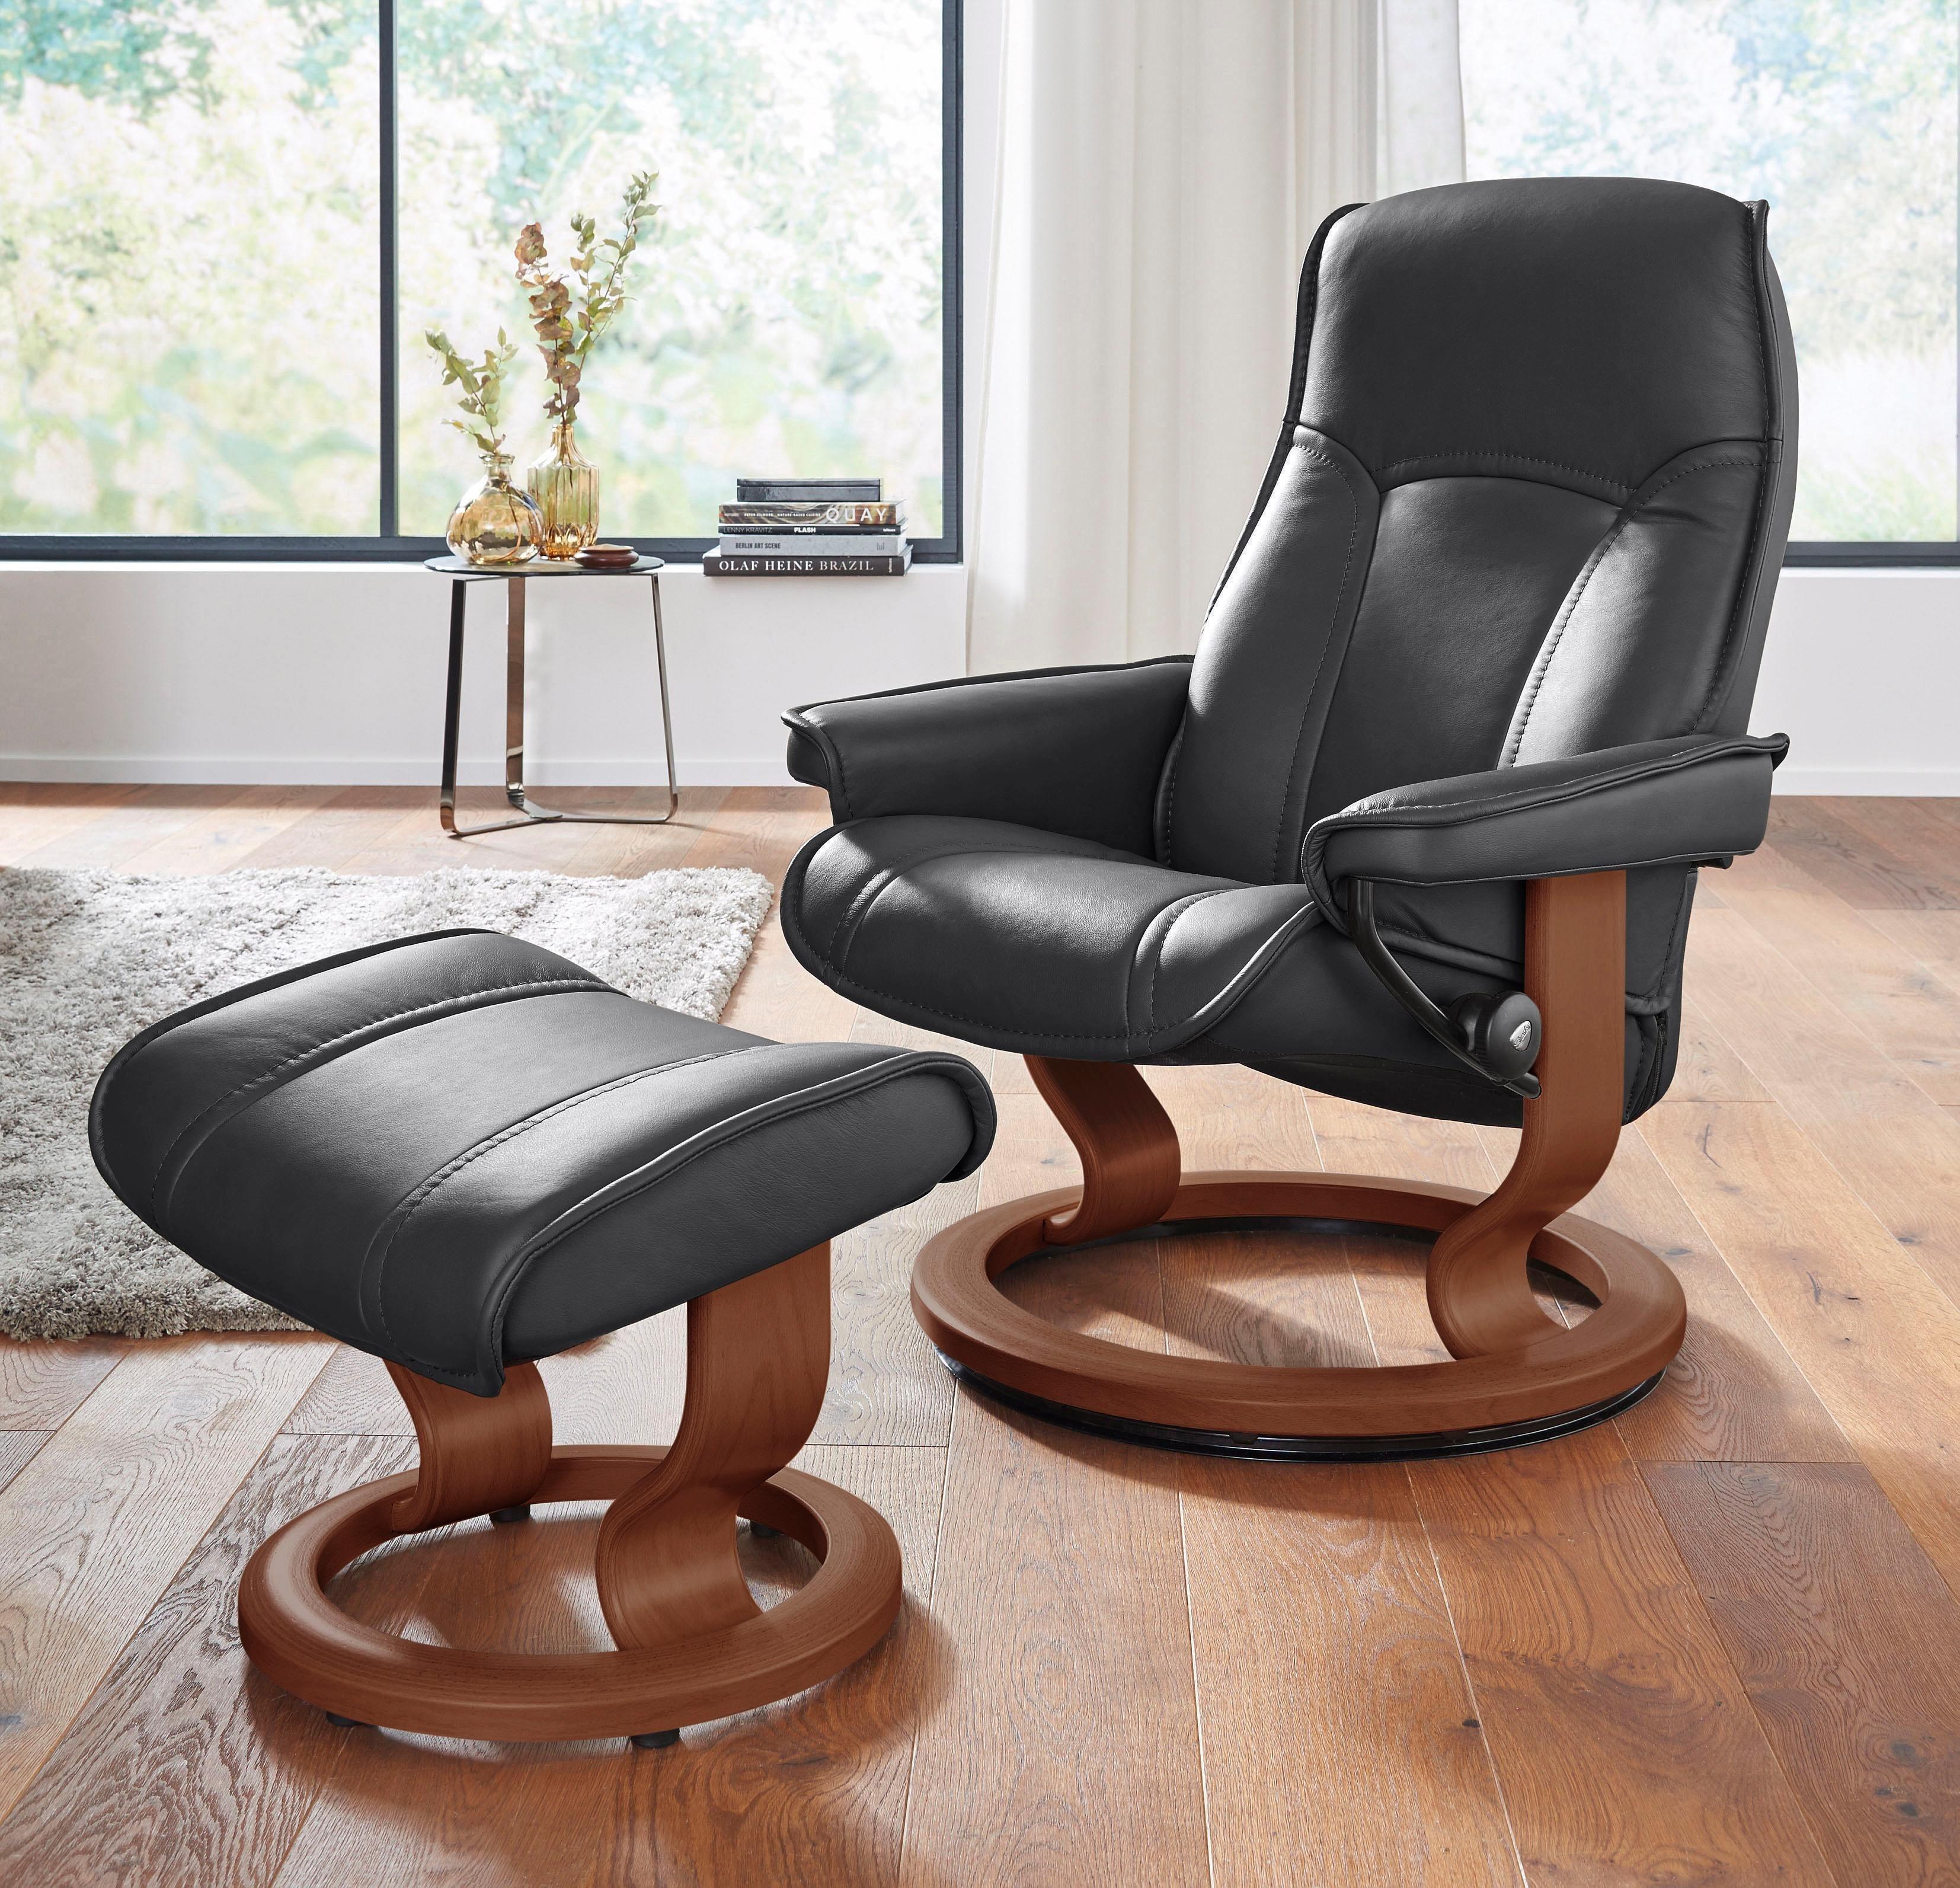 stressless relaxsessel online kaufen m bel suchmaschine. Black Bedroom Furniture Sets. Home Design Ideas